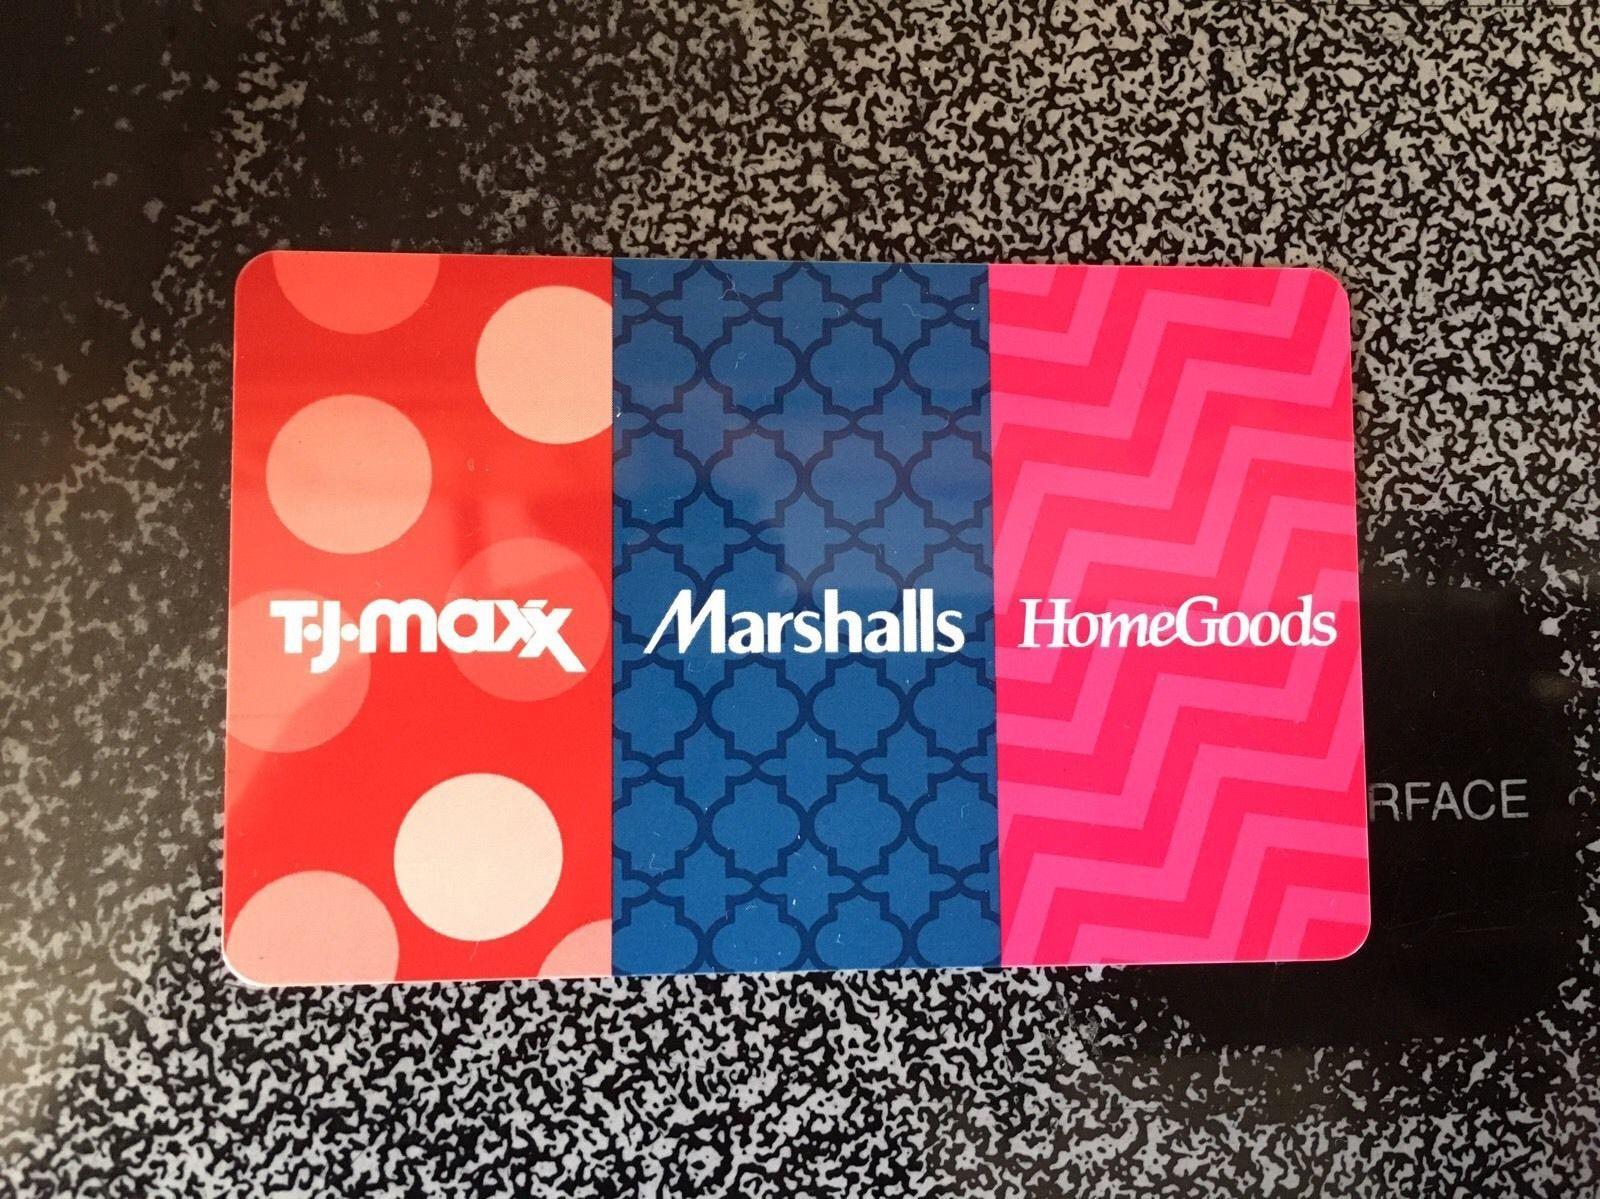 TJ Maxx Marshalls Home Goods Gift Card  450 55   302181869135    Gift Cards    Coupons   Gift Cards for  385 00. TJ Maxx Marshalls Home Goods Gift Card  450 55   302181869135